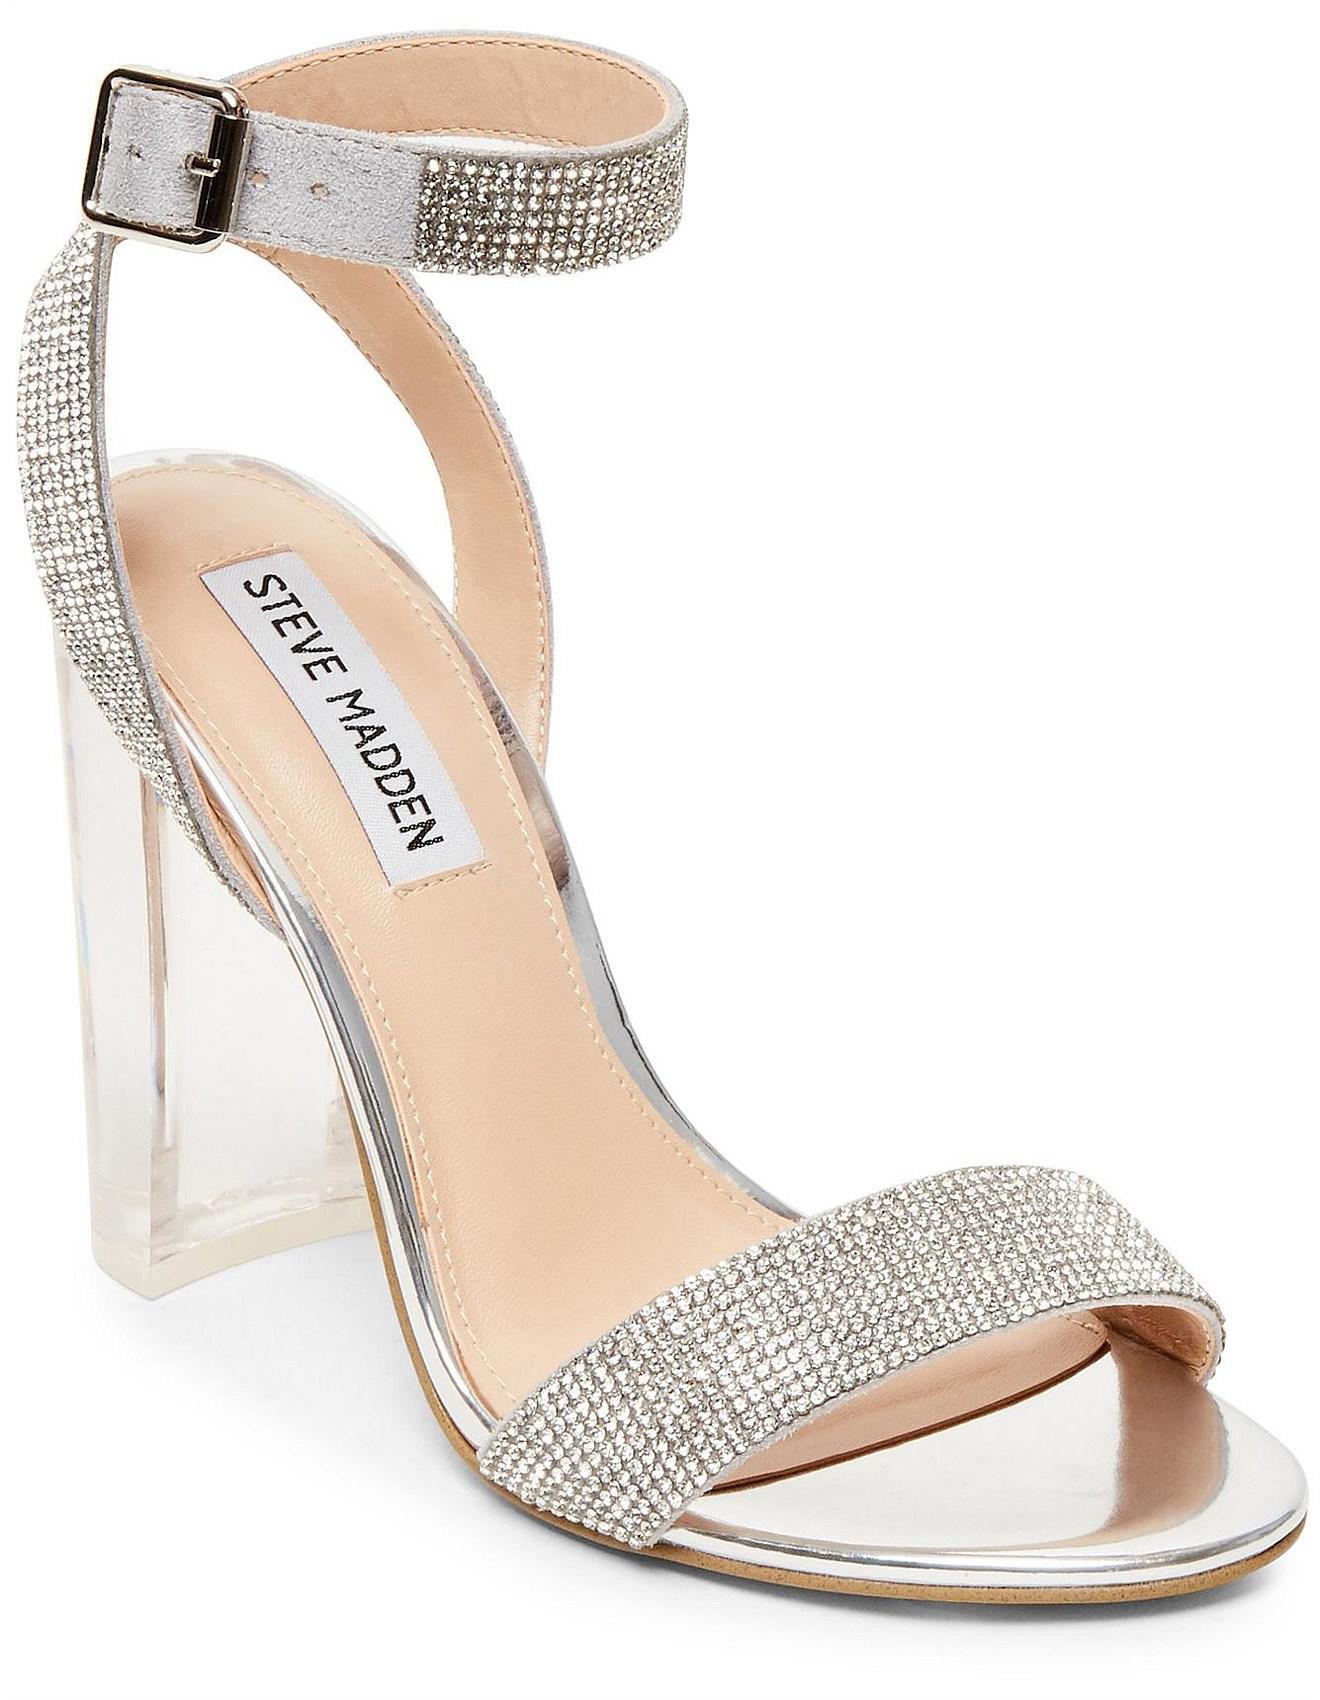 Marilyn Moda Girls Silver Glitter Heel with Rhinestone Studded Buckle Detail